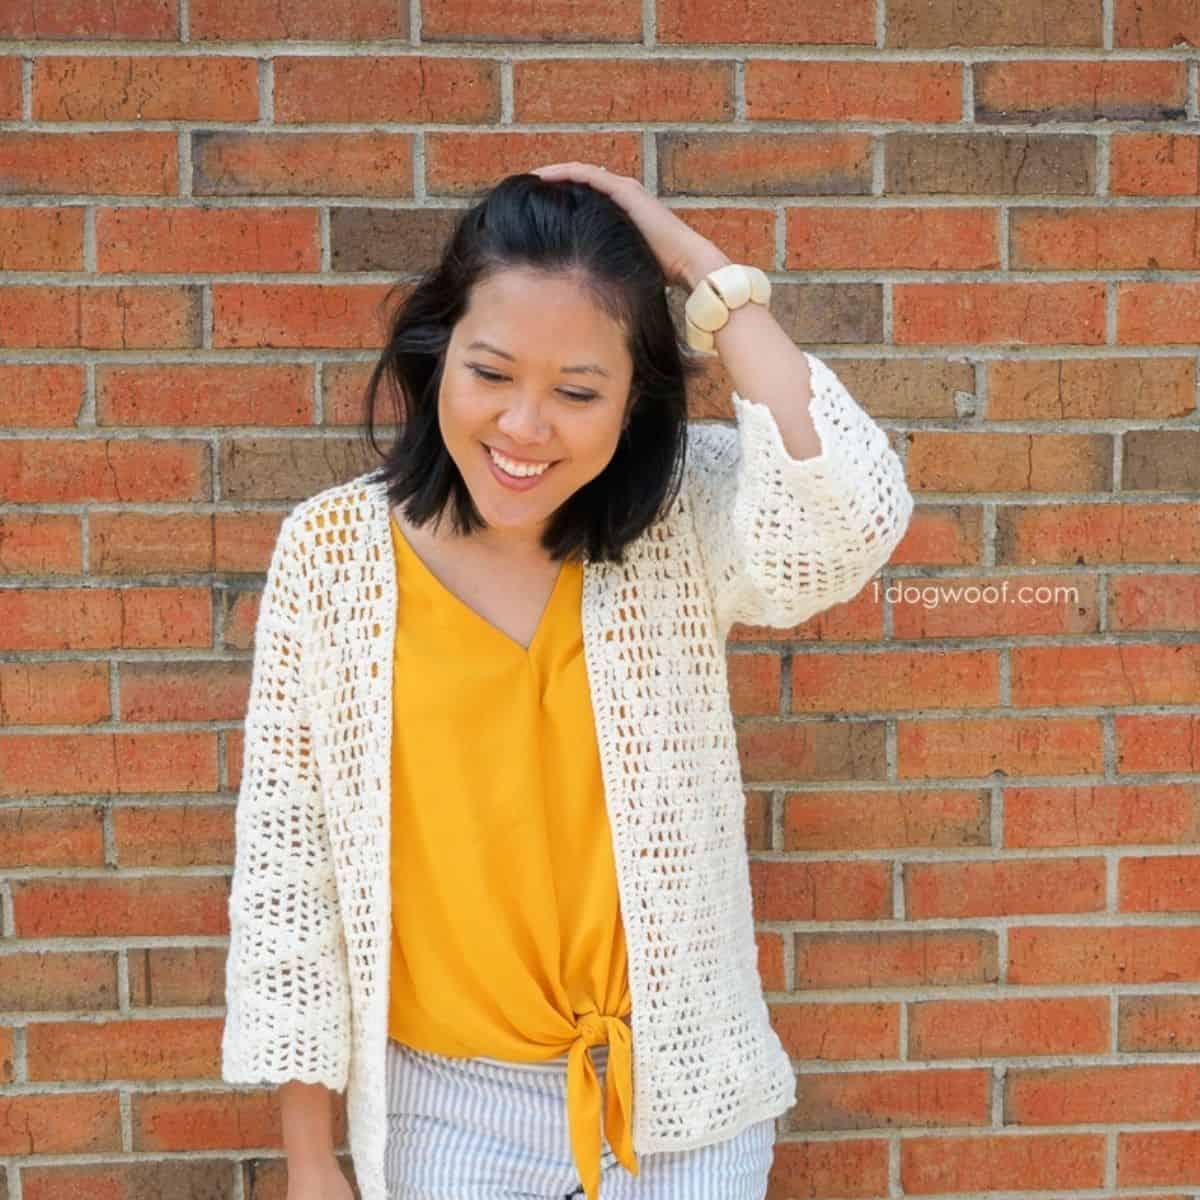 woman wearing bright yellow shirt and crocheted cardigan